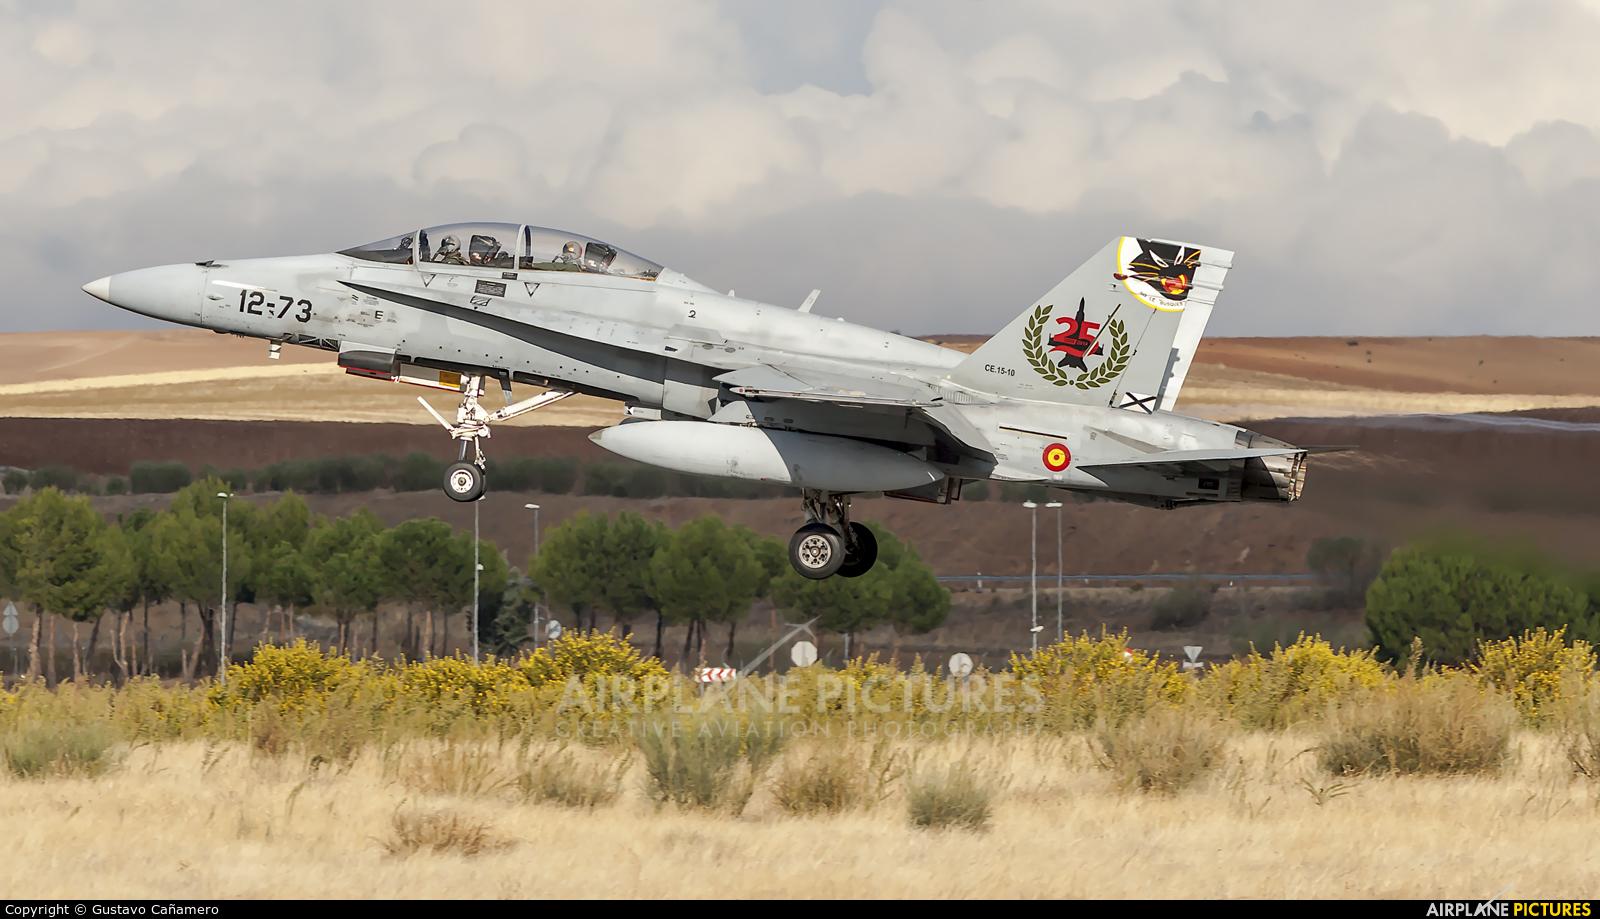 Spain - Air Force CE.15-10 aircraft at Madrid - Torrejon